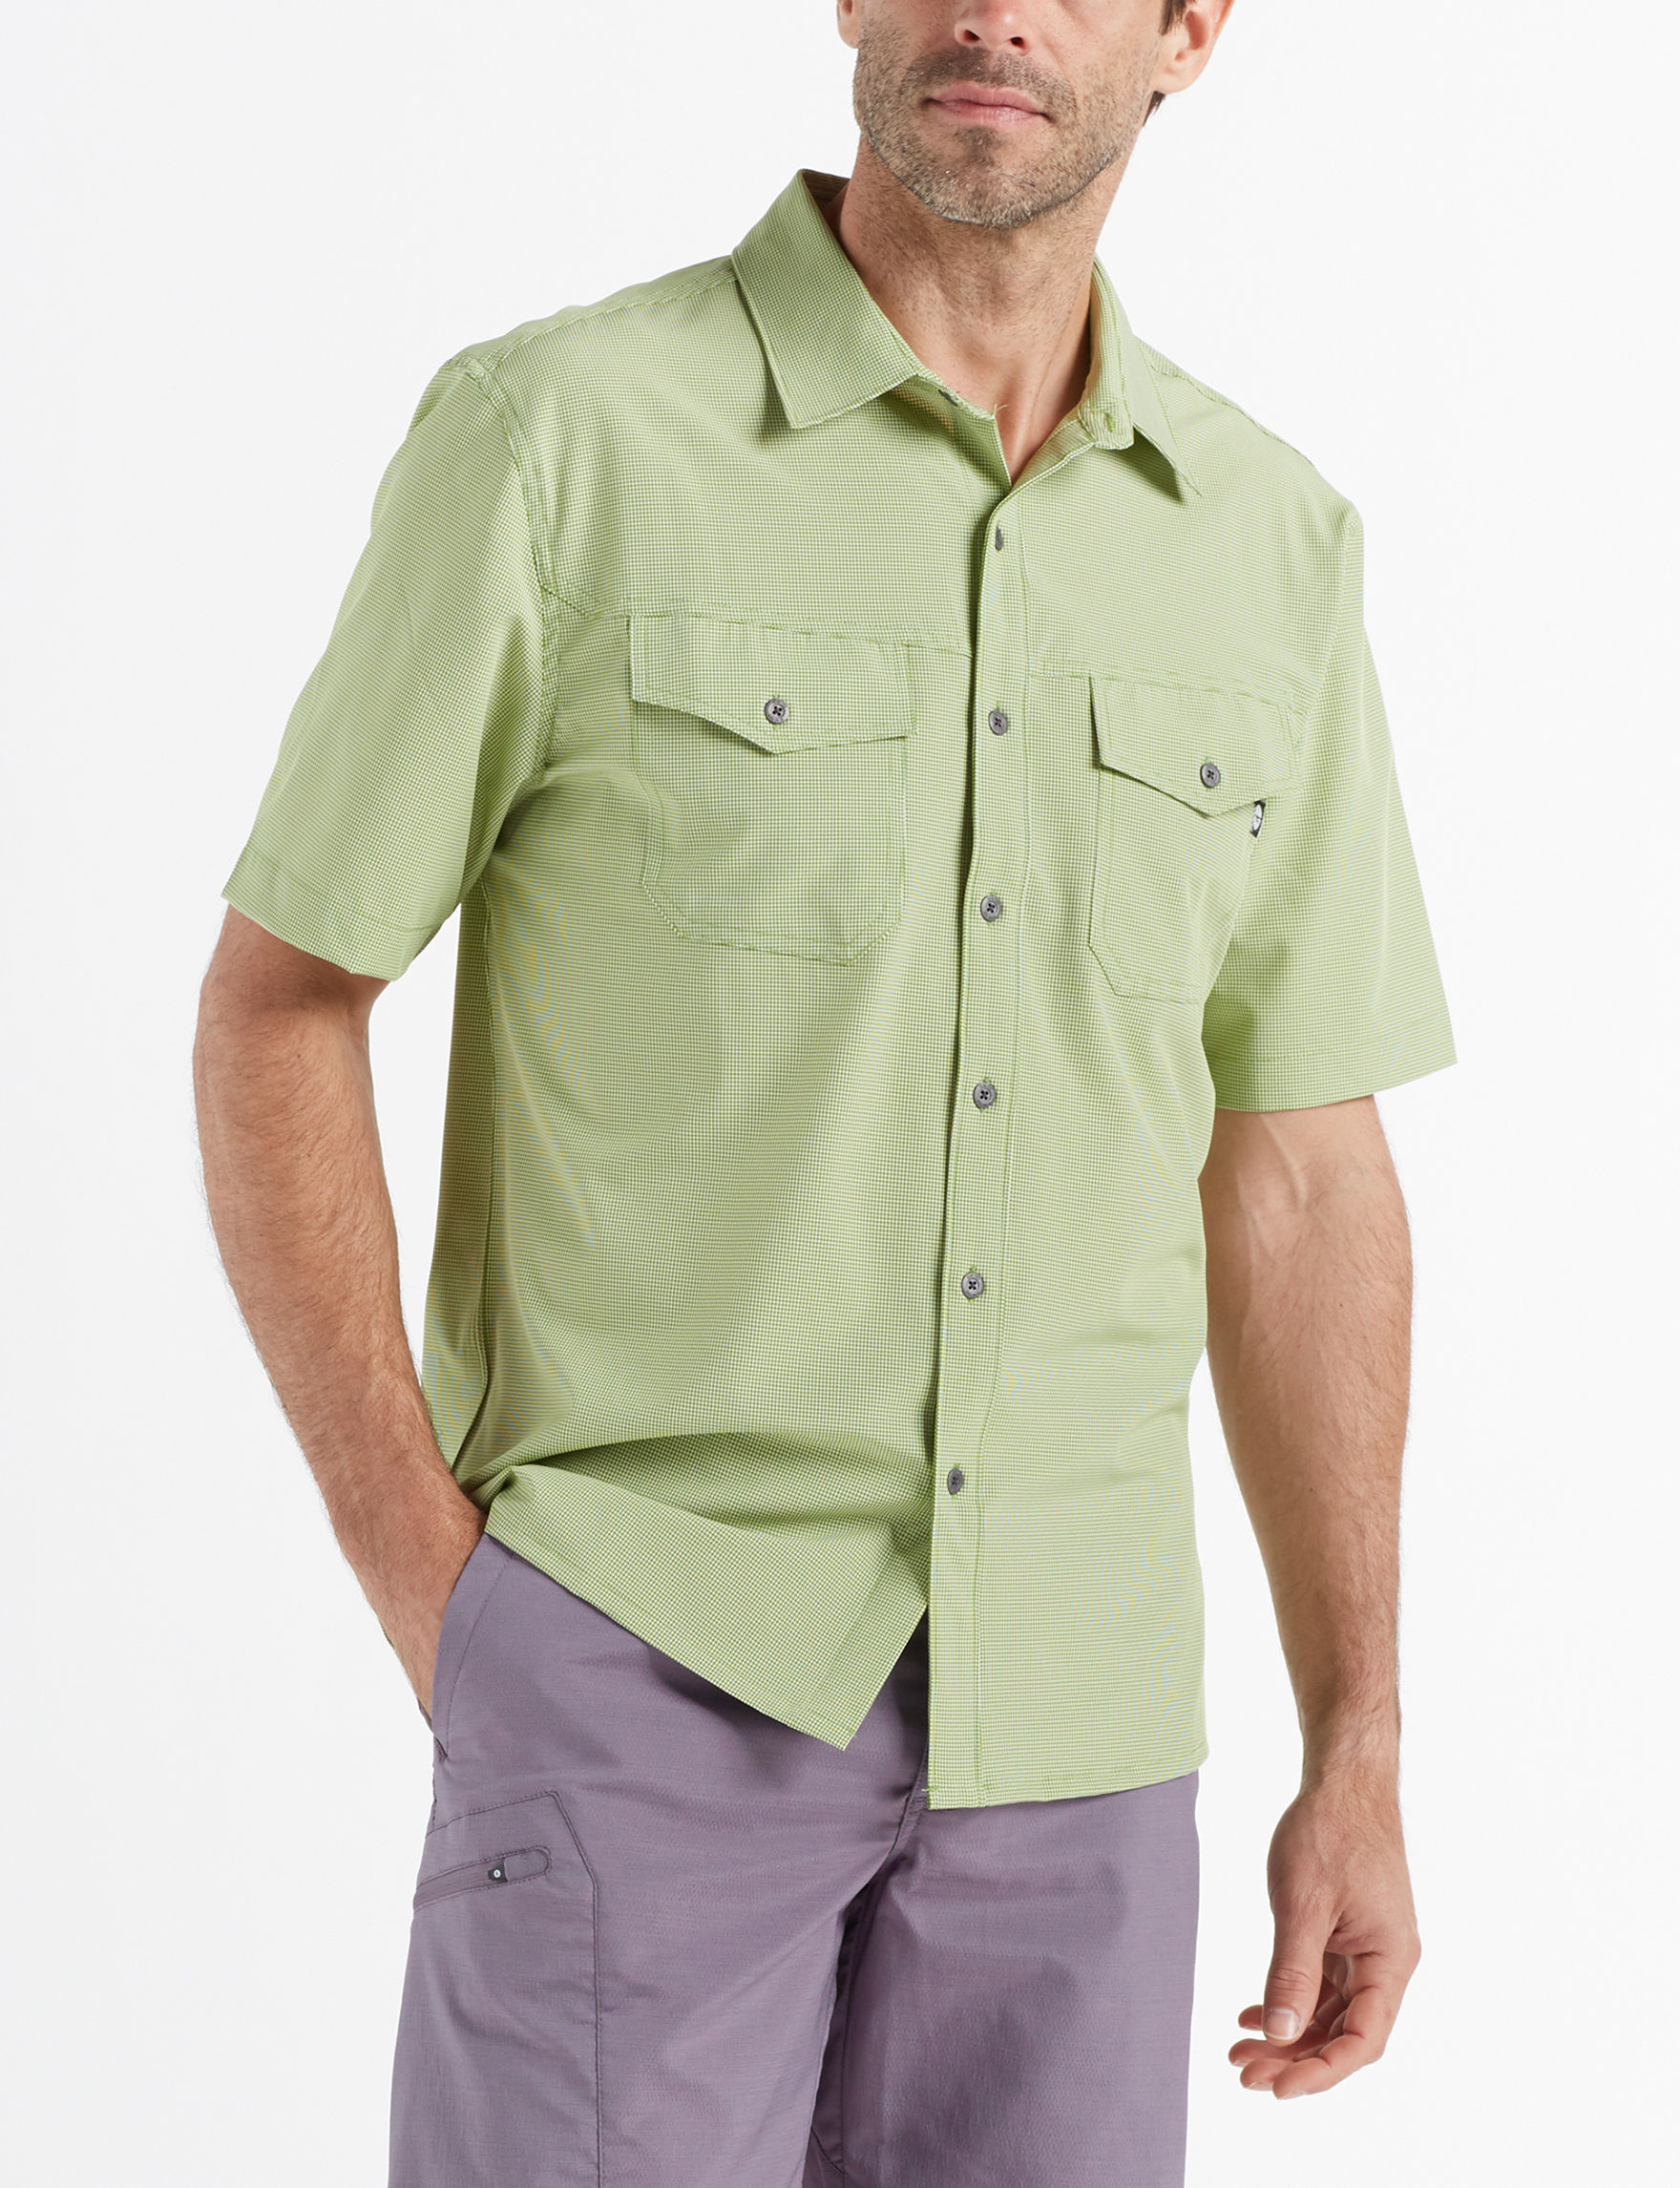 Hi-Tec Piquant Green Casual Button Down Shirts